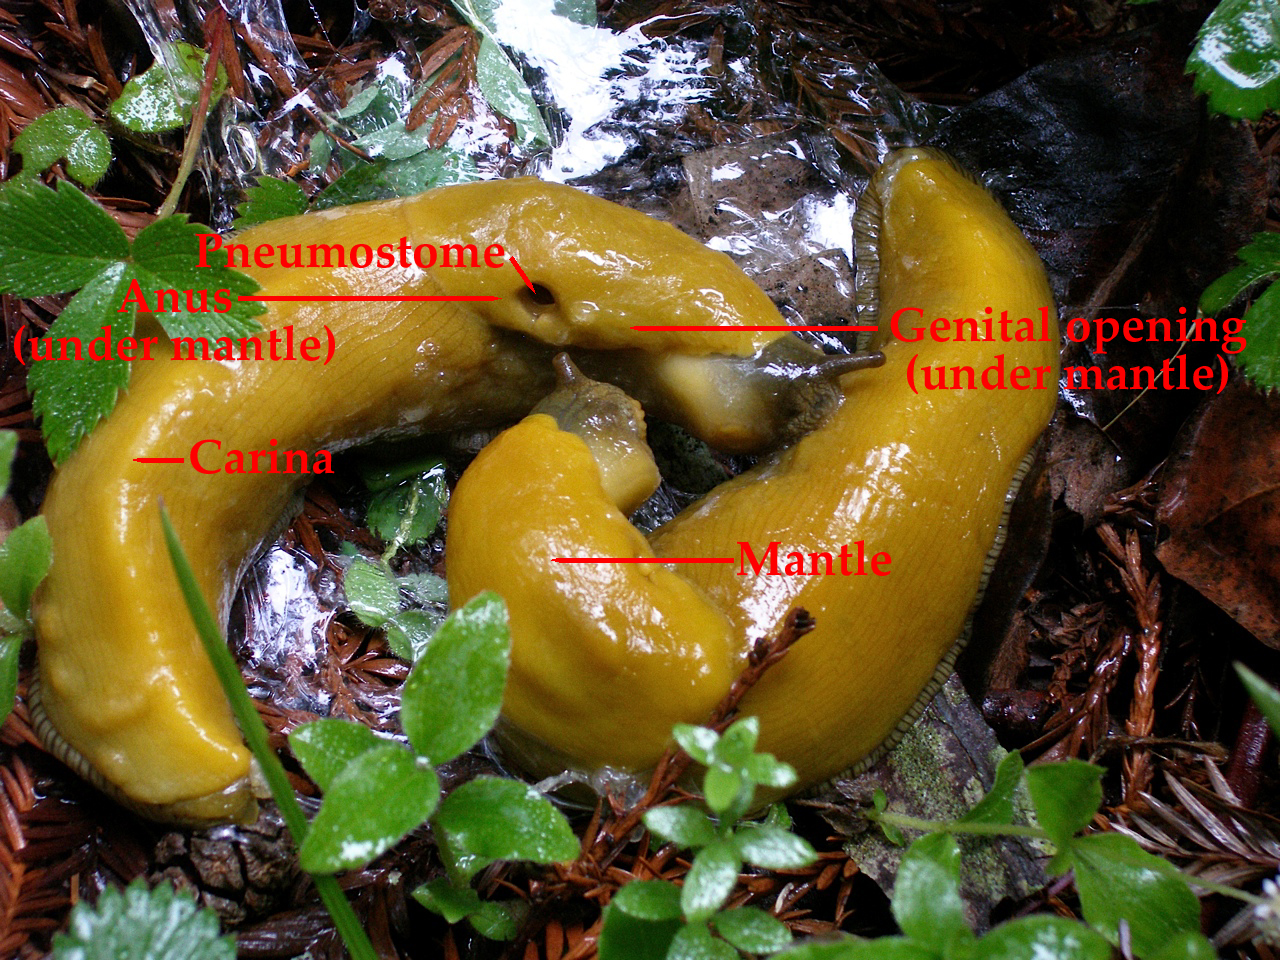 Sex with of pictures slug dolichophallus) banana banana. (ariolimax